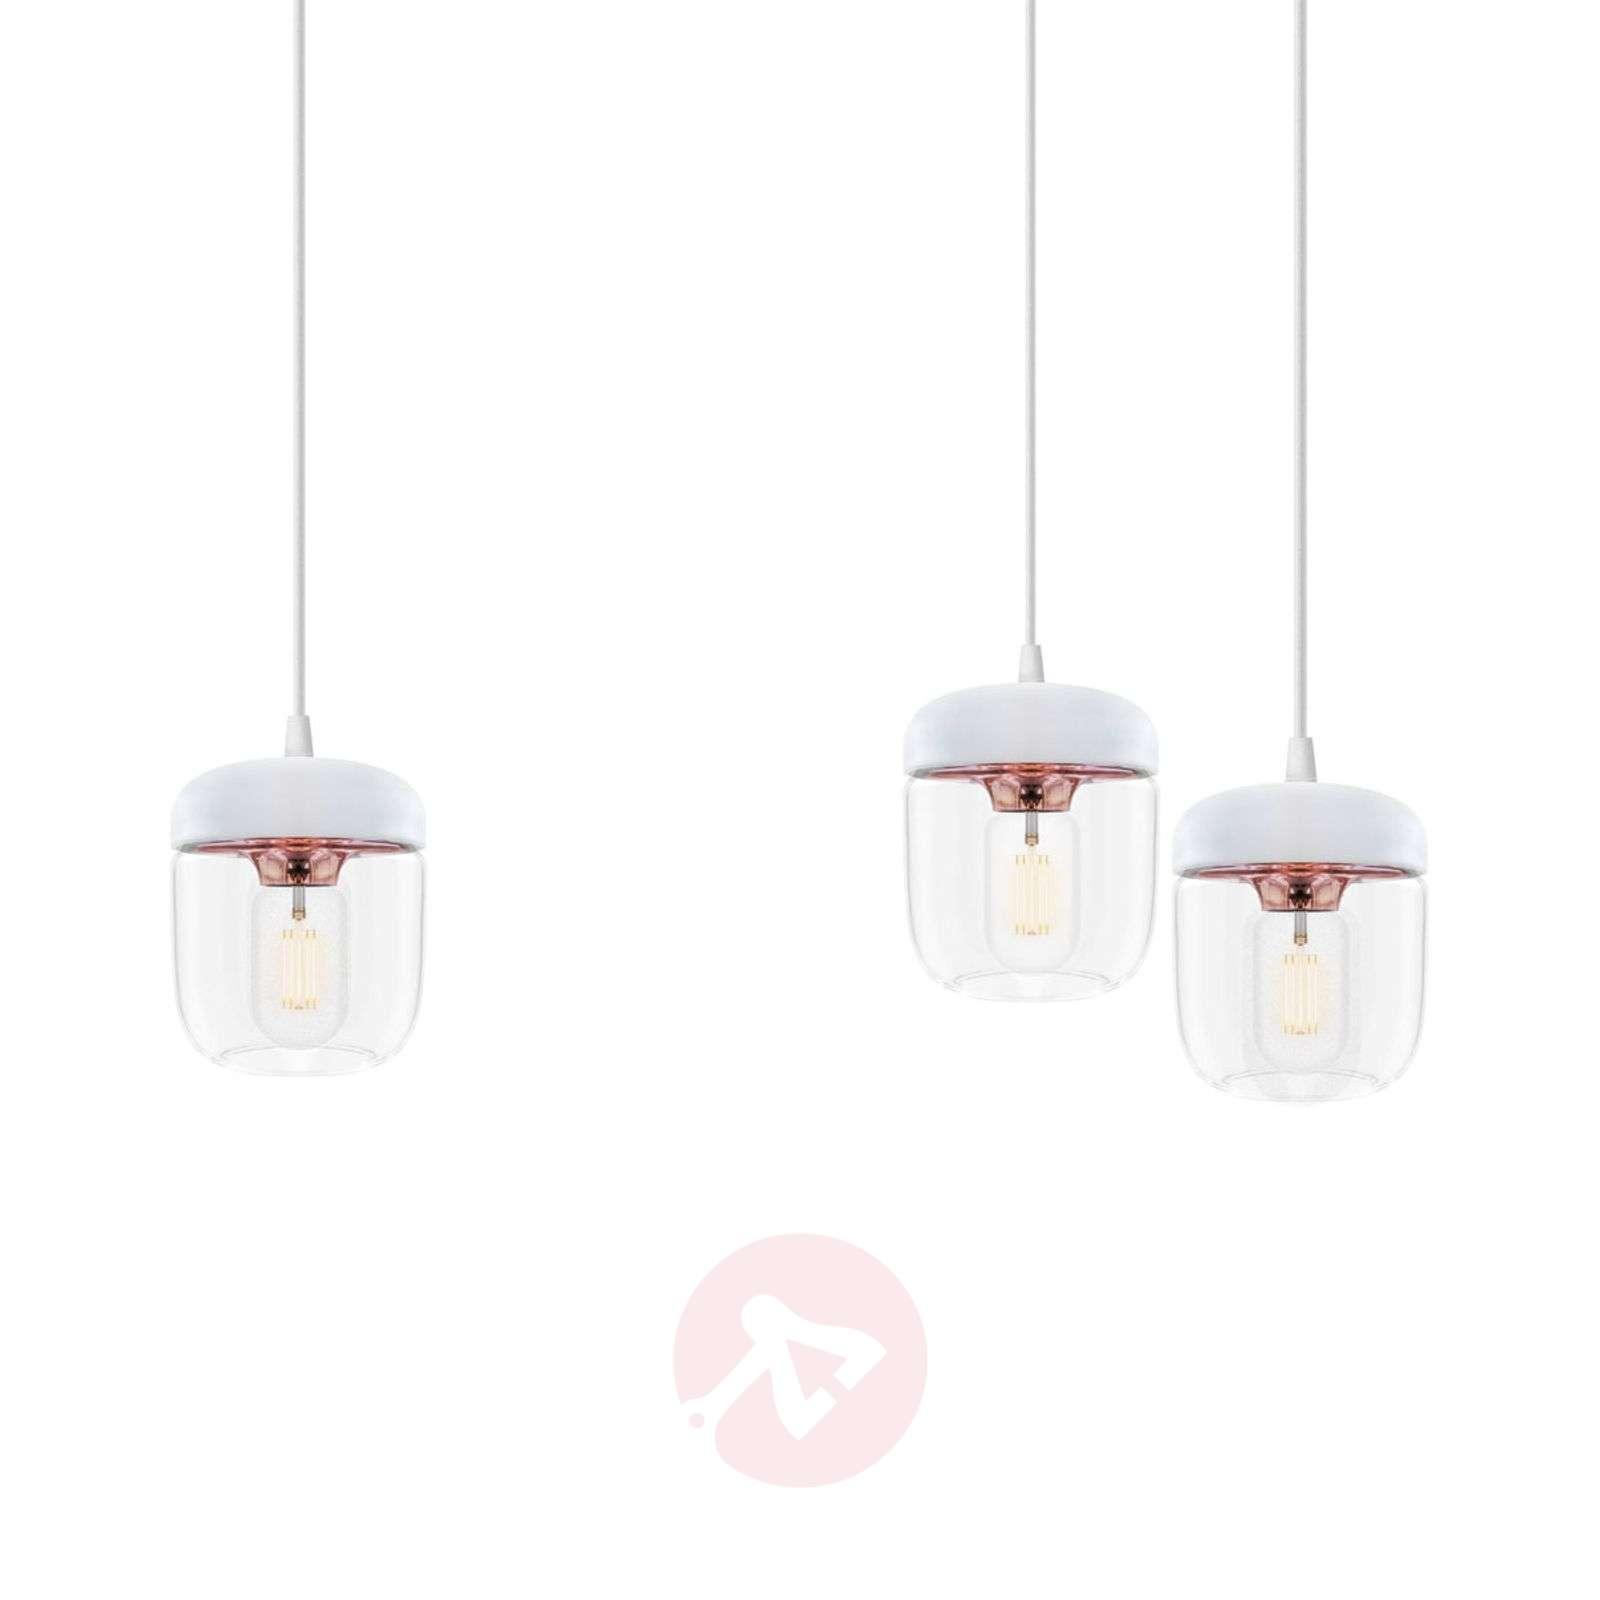 UMAGE Acorn hanging light three-bulb, white/copper-9521095-01